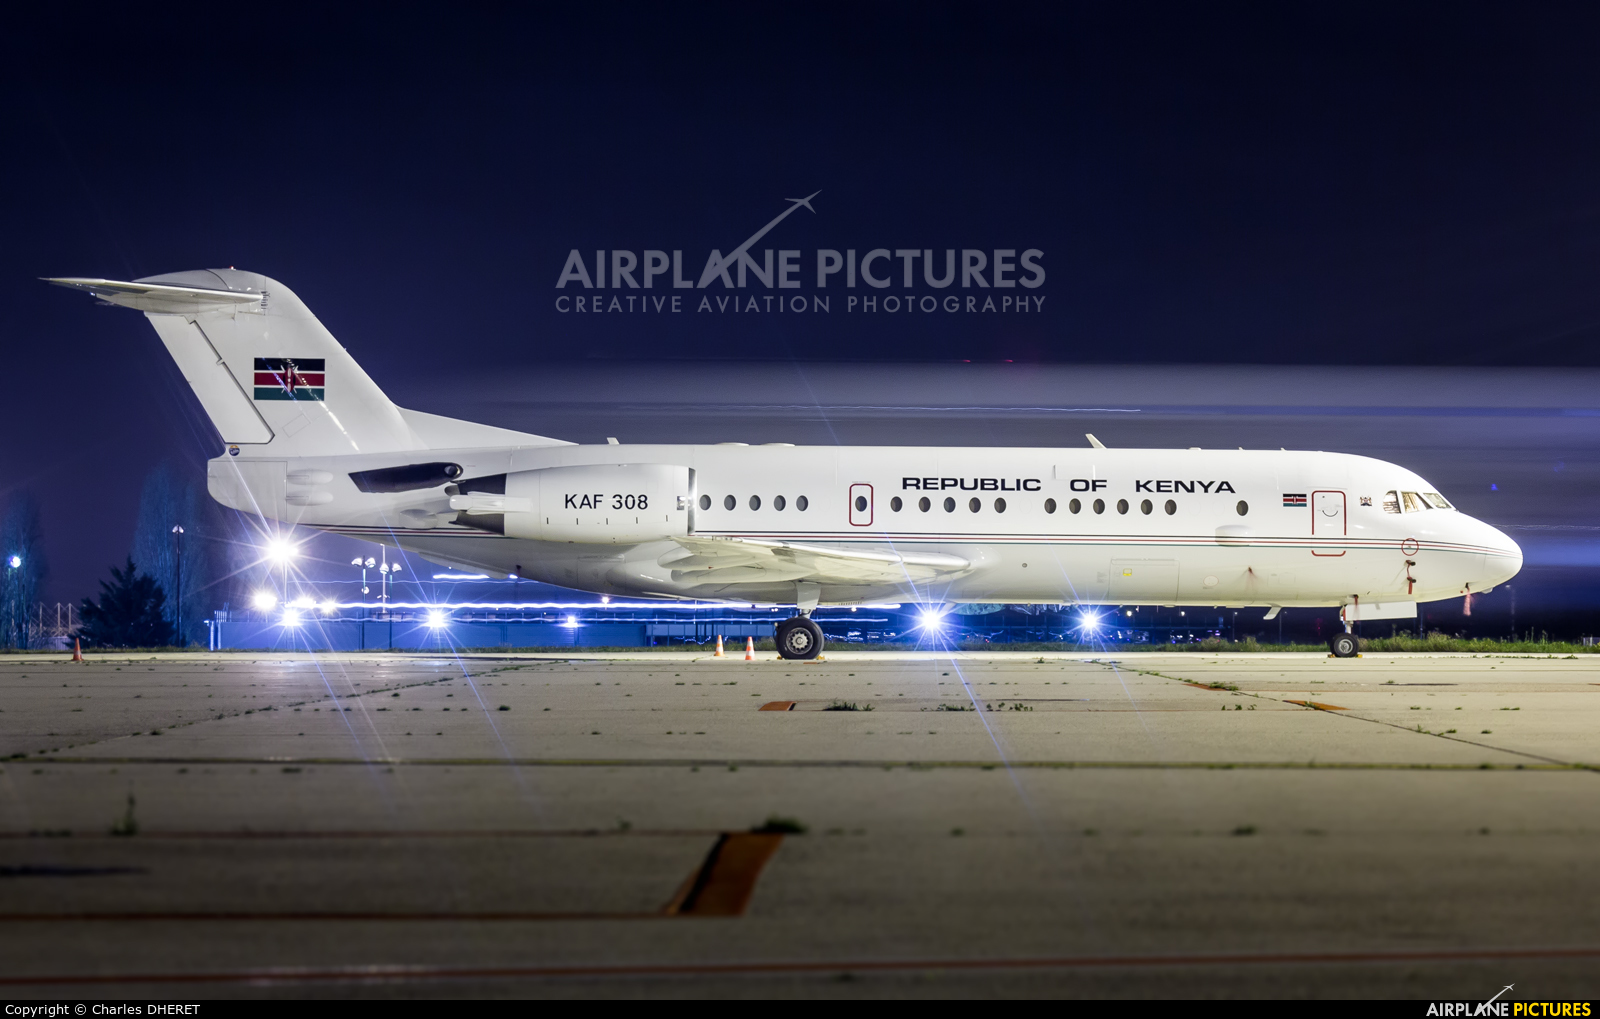 Kenya - Government KAF308 aircraft at Paris - Charles de Gaulle